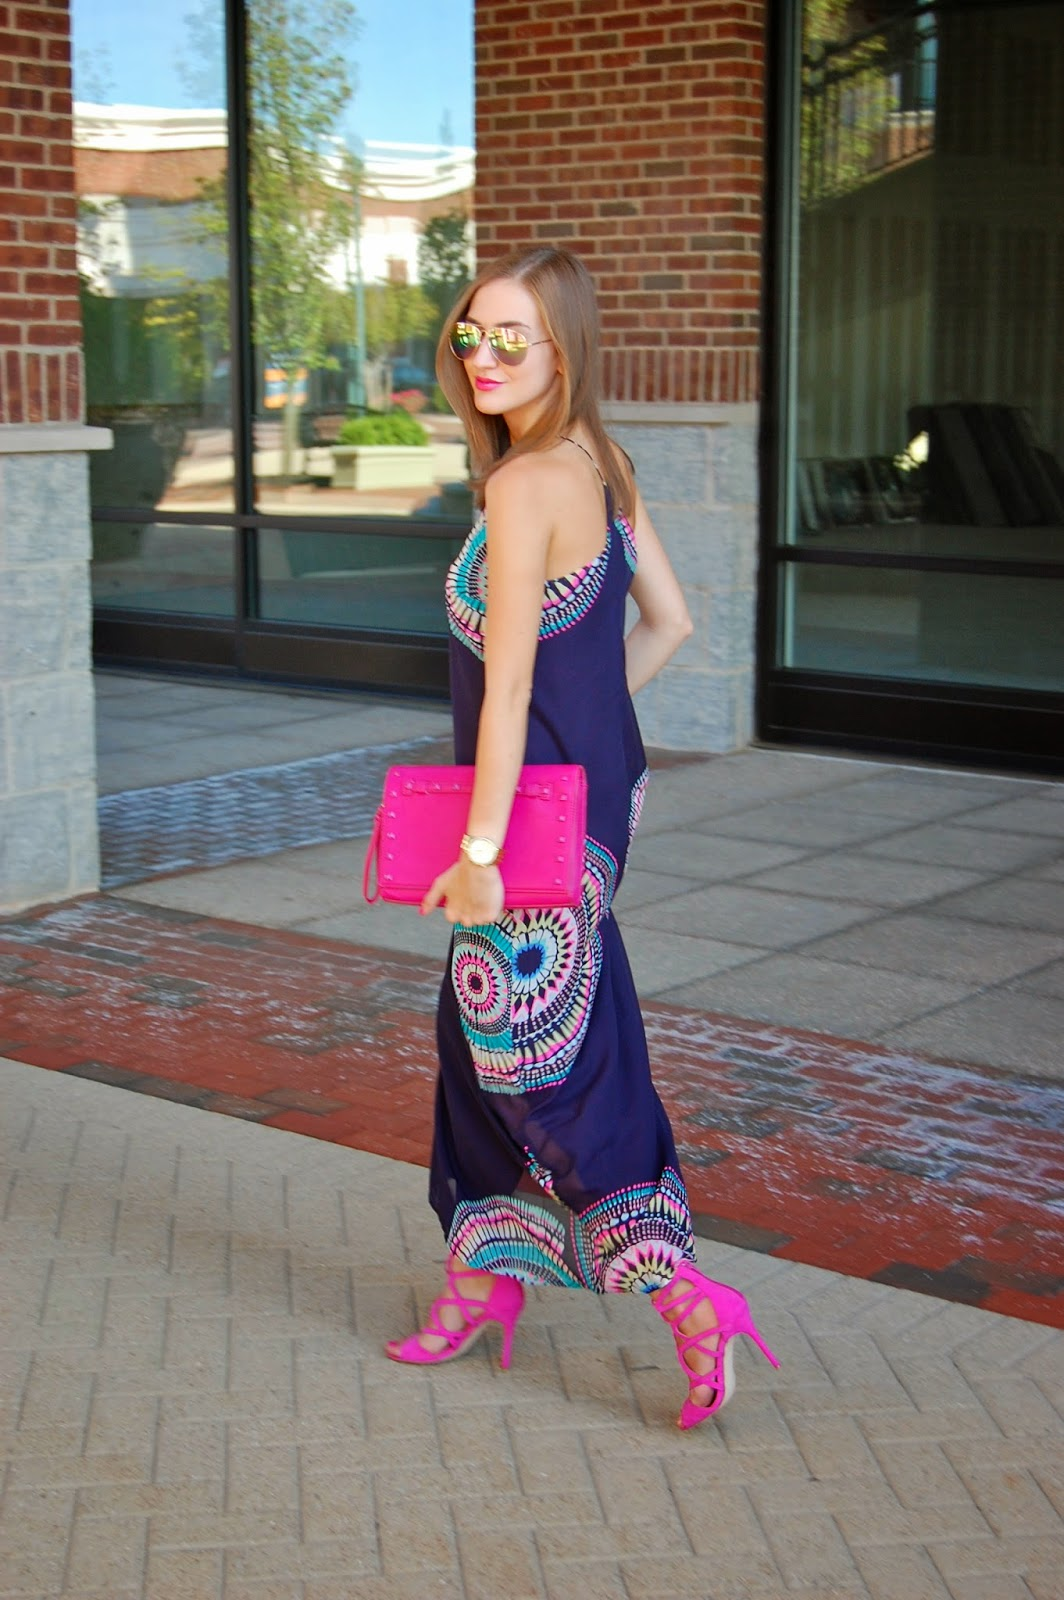 Wearing Old Navy Navy Blue Women's Sunburst Chiffon Maxi Dress, Neiman Marcus Pink Studded Tonal Clutch, Wearing Just Fab Emmey Violet Lace Up Heels, Summer 2014 Dress Looks